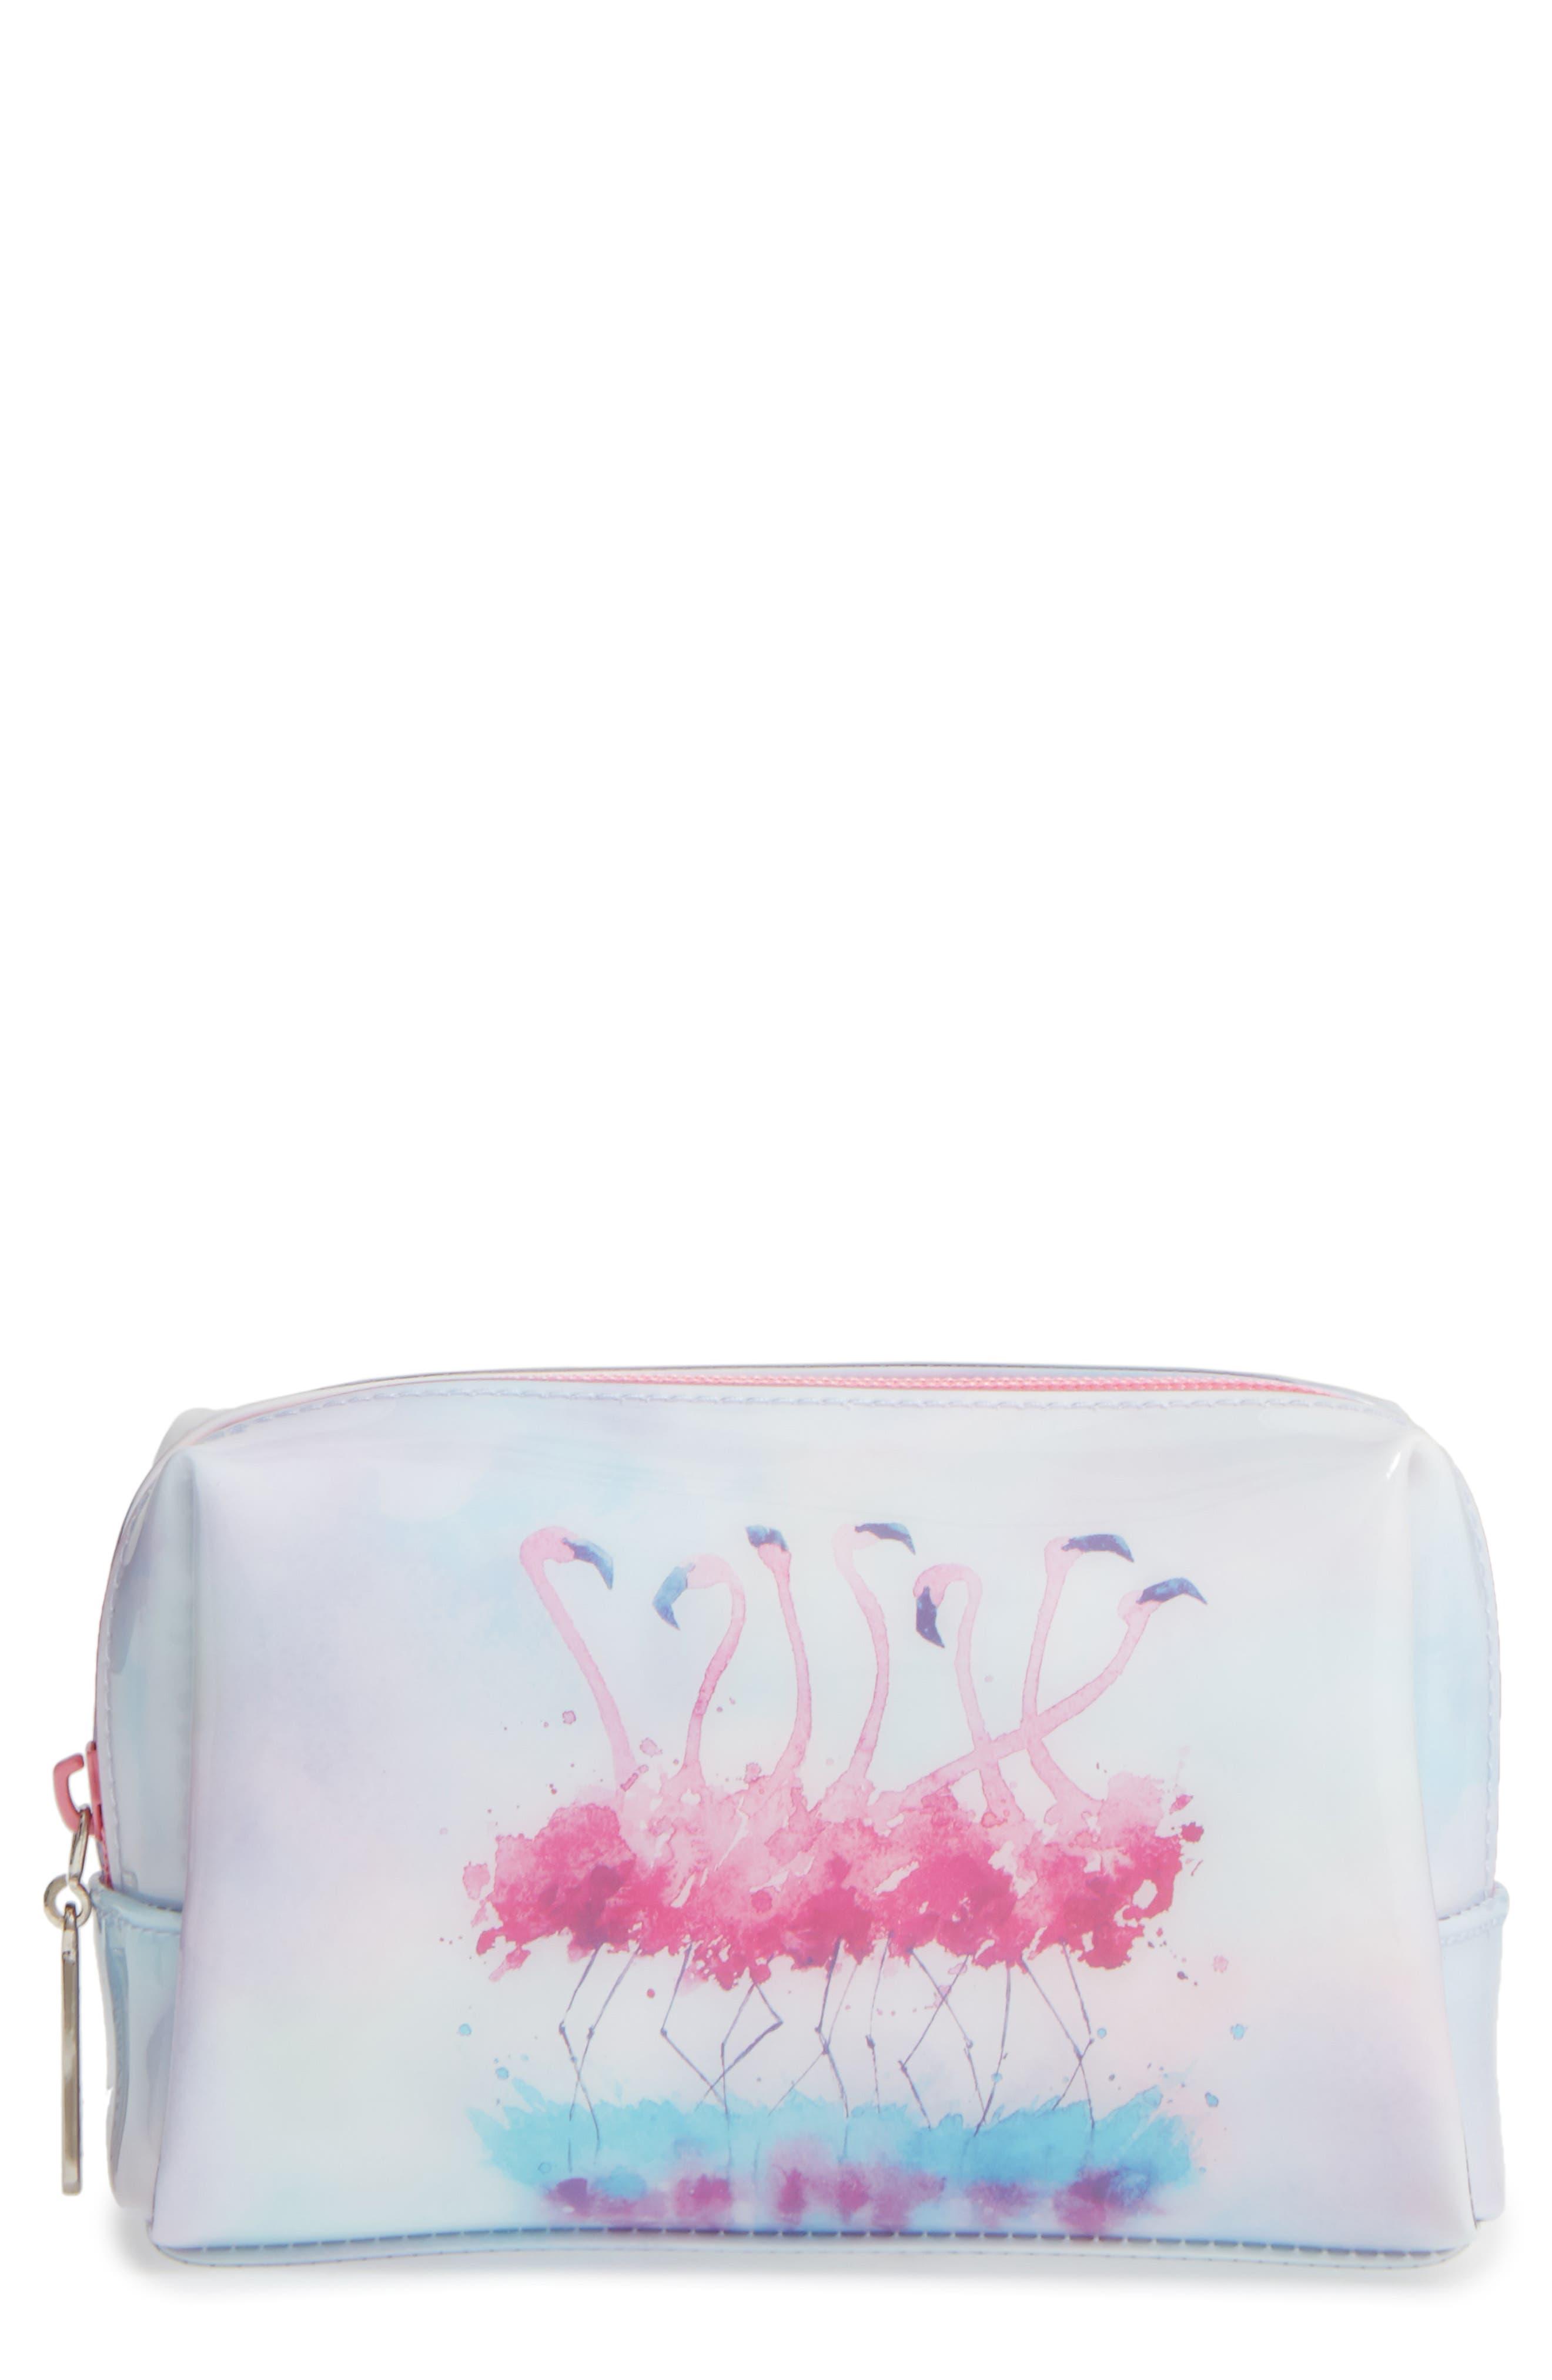 Alternate Image 1 Selected - Catseye London Flamingo Cosmetics Bag